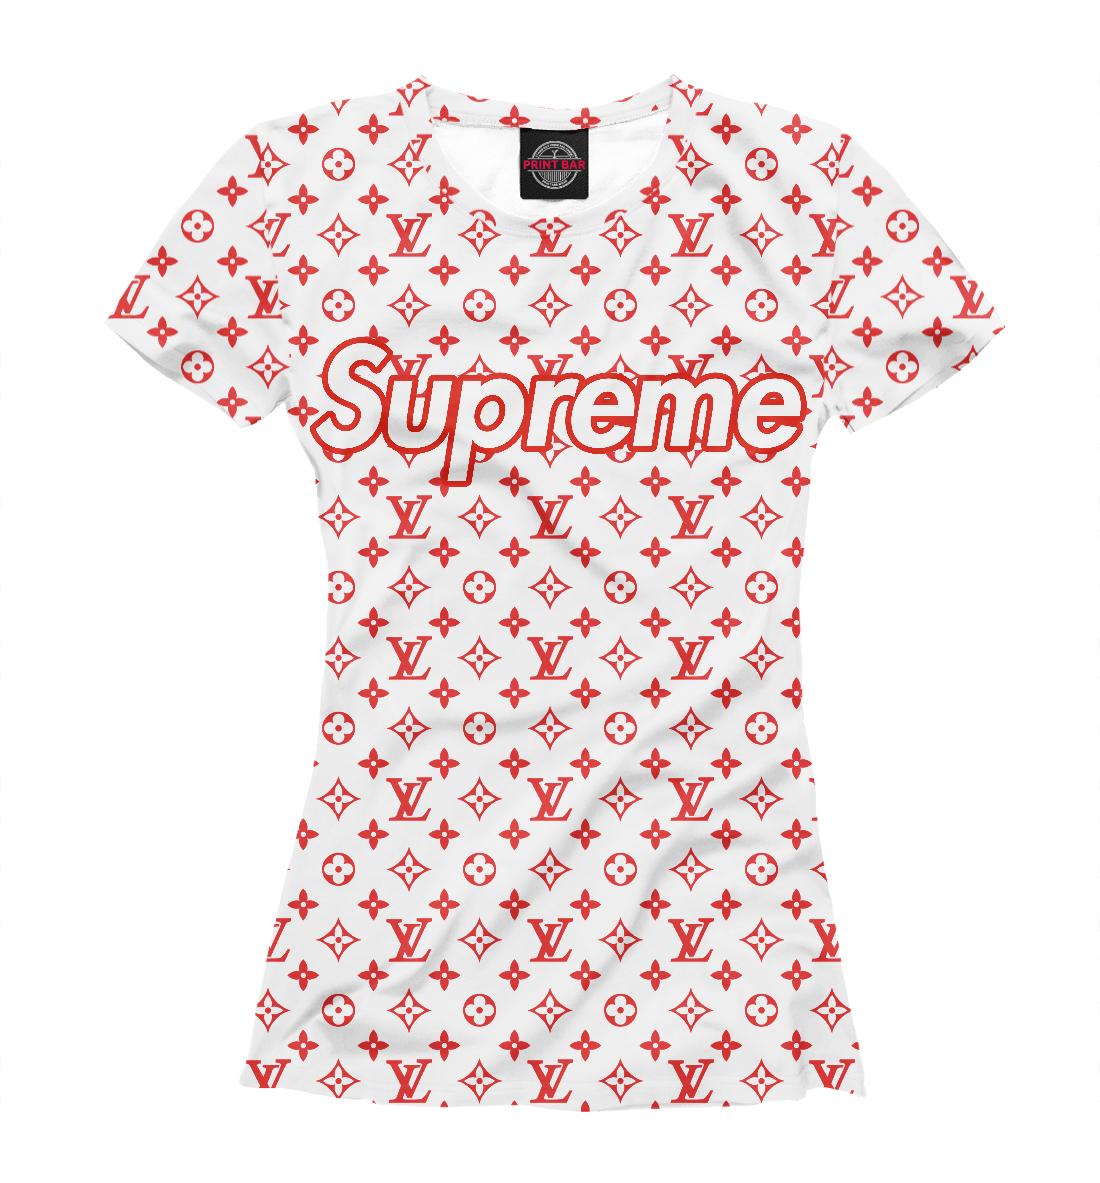 Купить Supreme Louis Vuitton, Printbar, Футболки, SPR-914390-fut-1